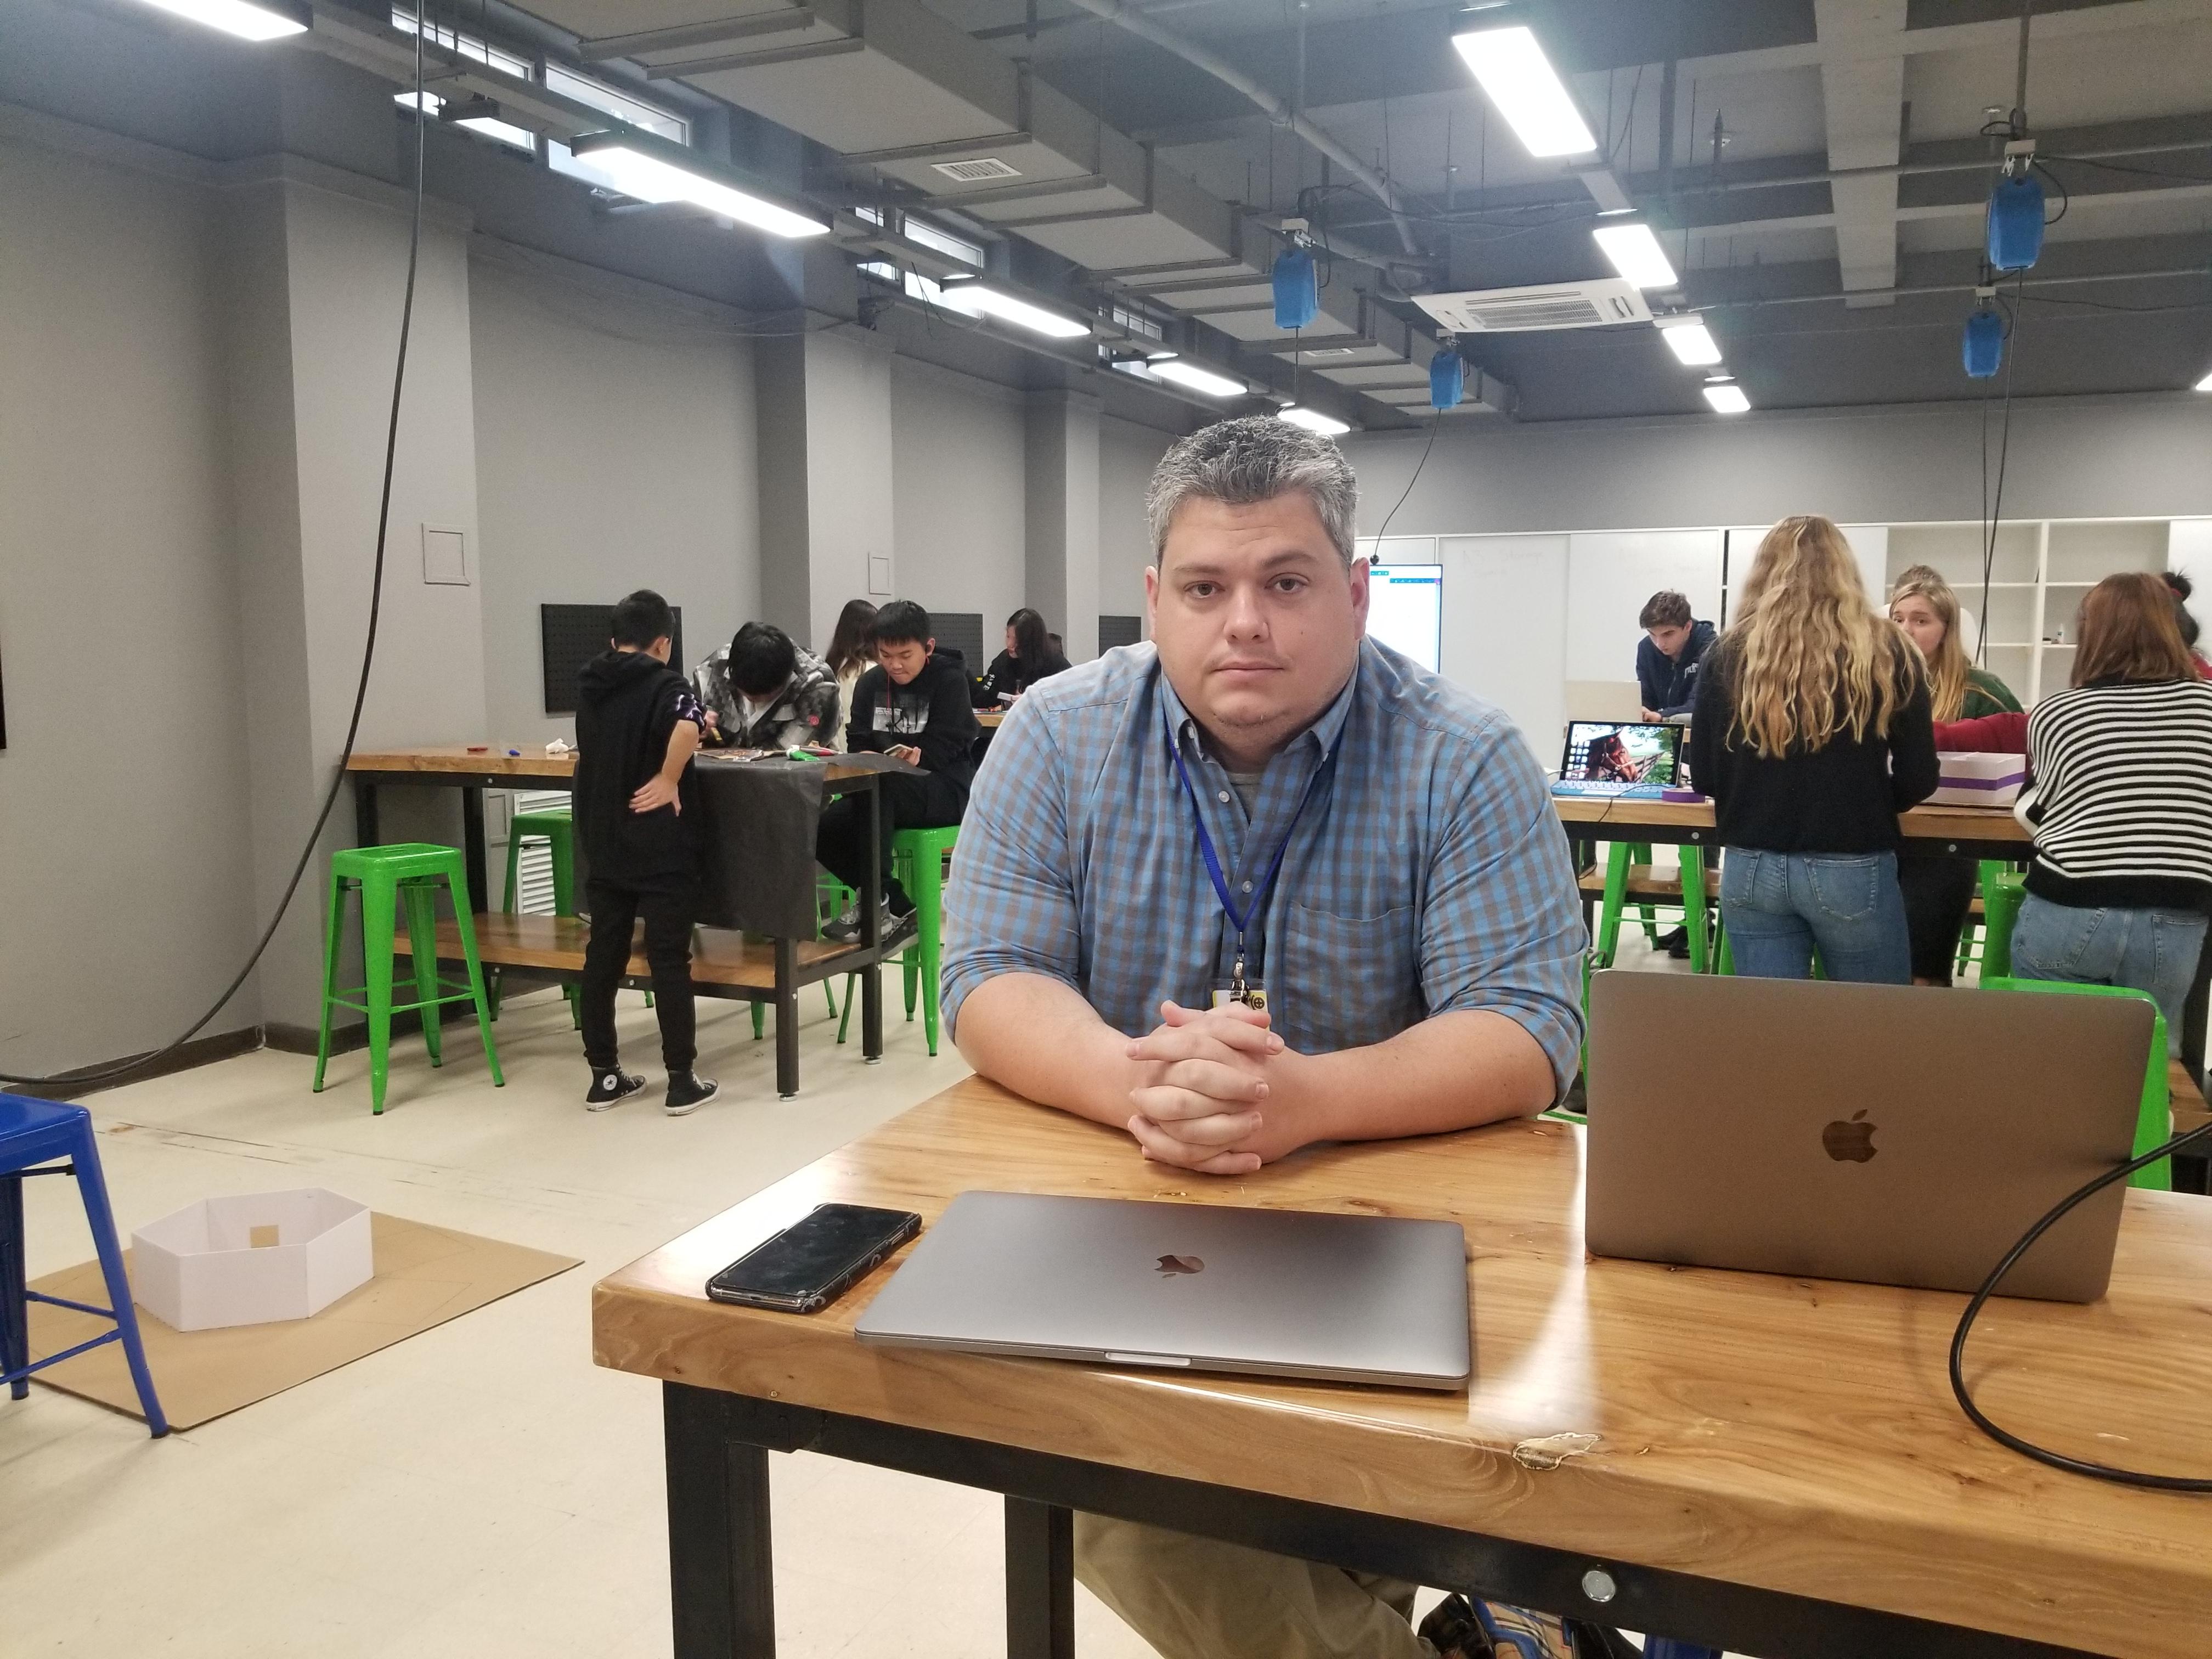 Justin Sheehan sitting in classroom